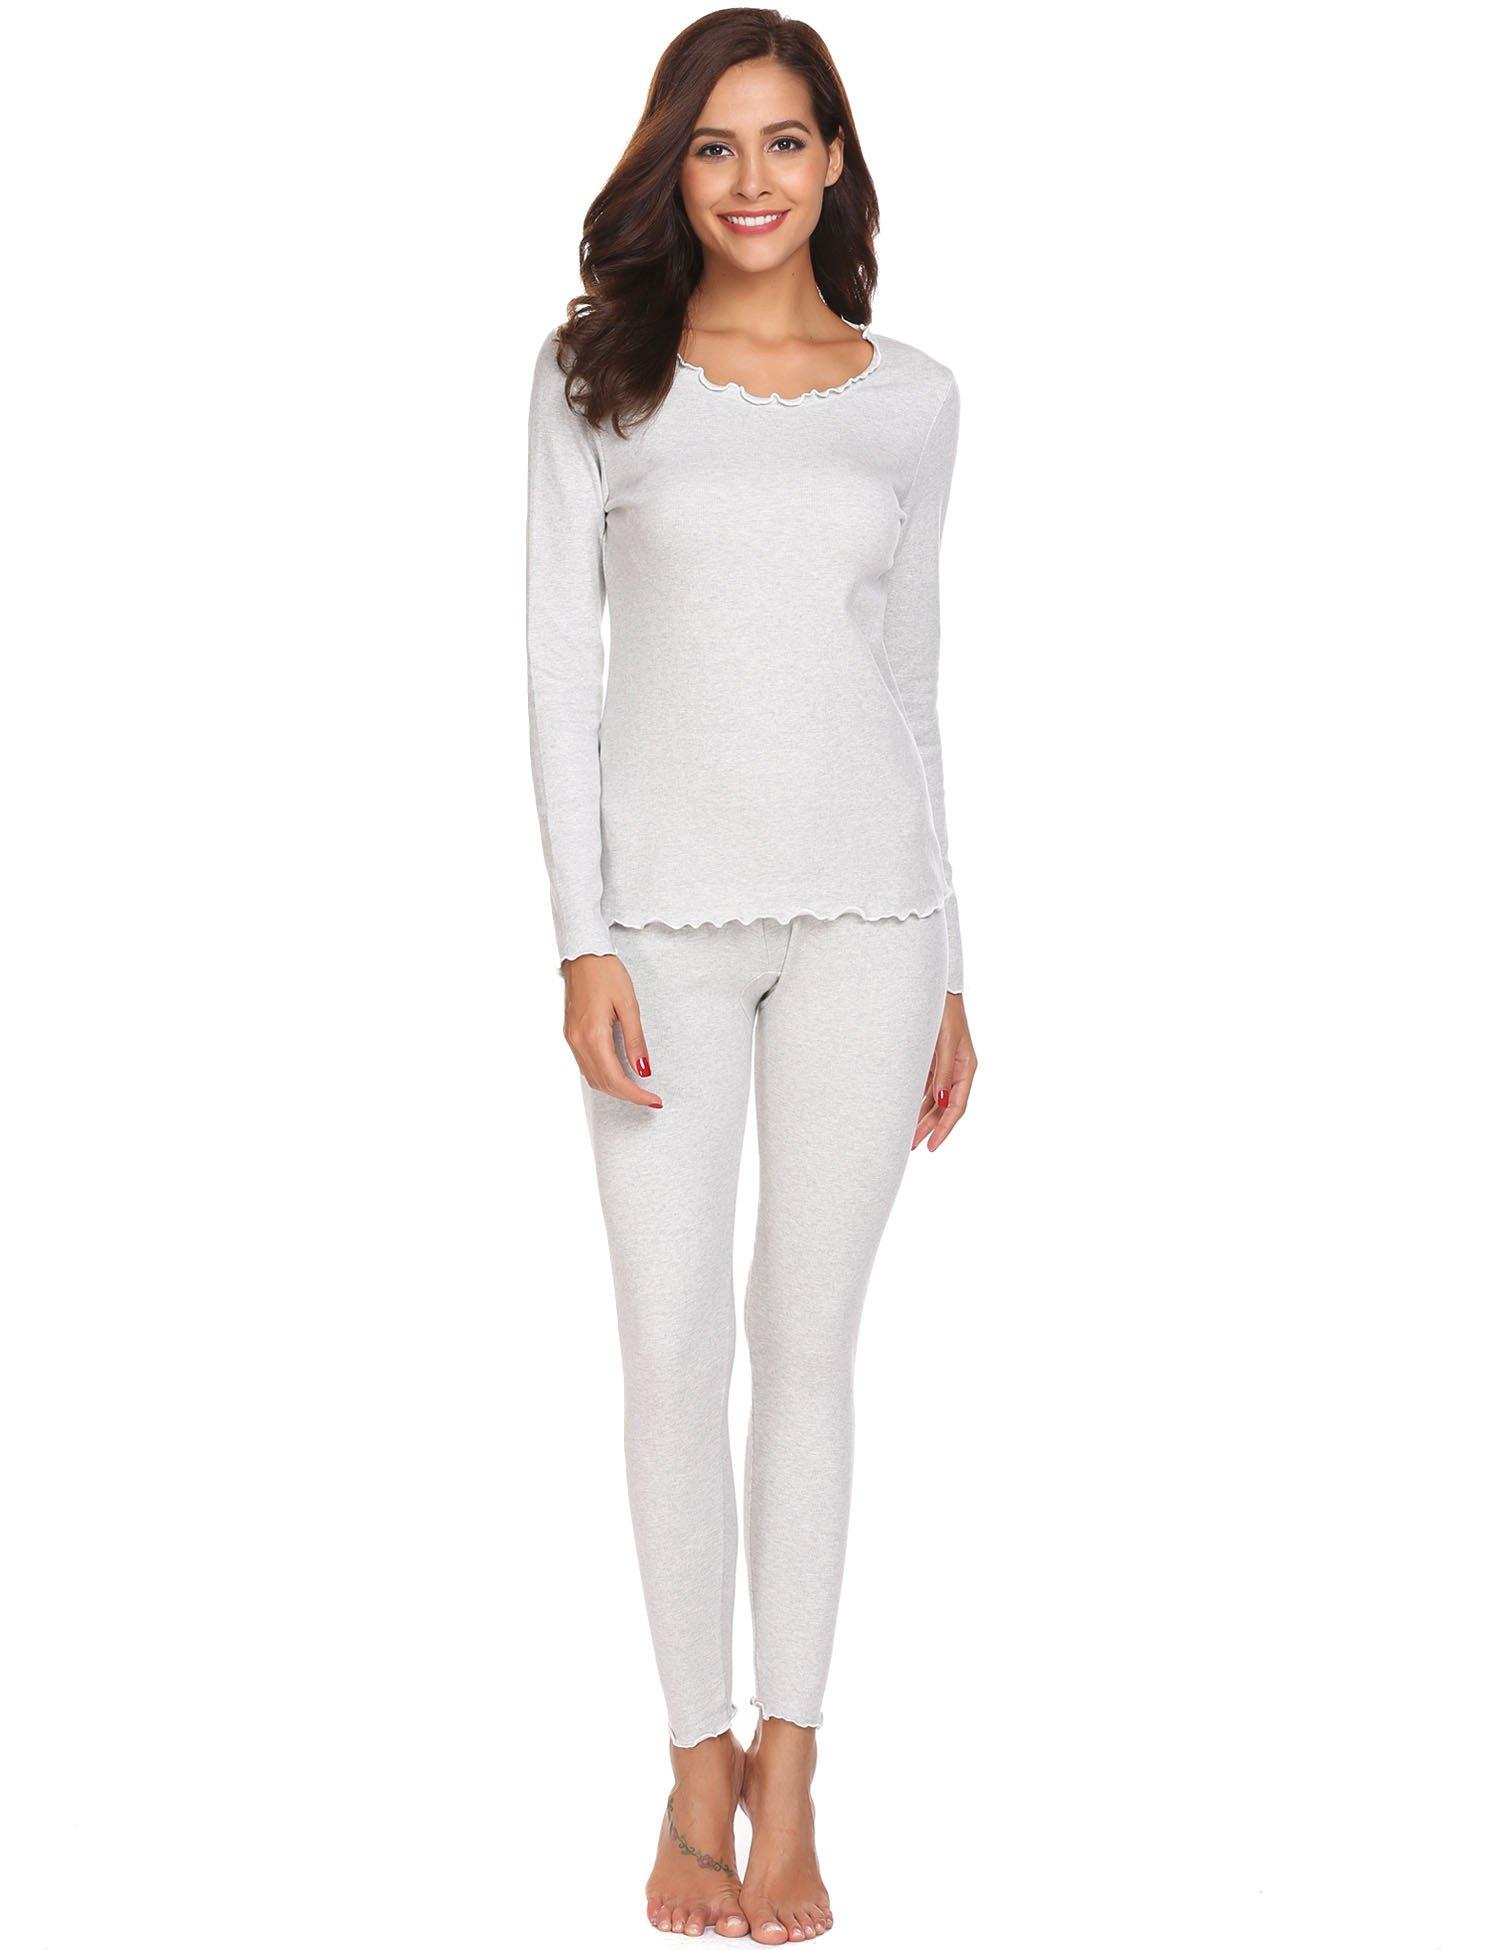 Ekouaer Thermal Sets Womens 2 Pcs Underwear Slimming Top & Bottom Pajama Ruffle Collar Grey X-Large